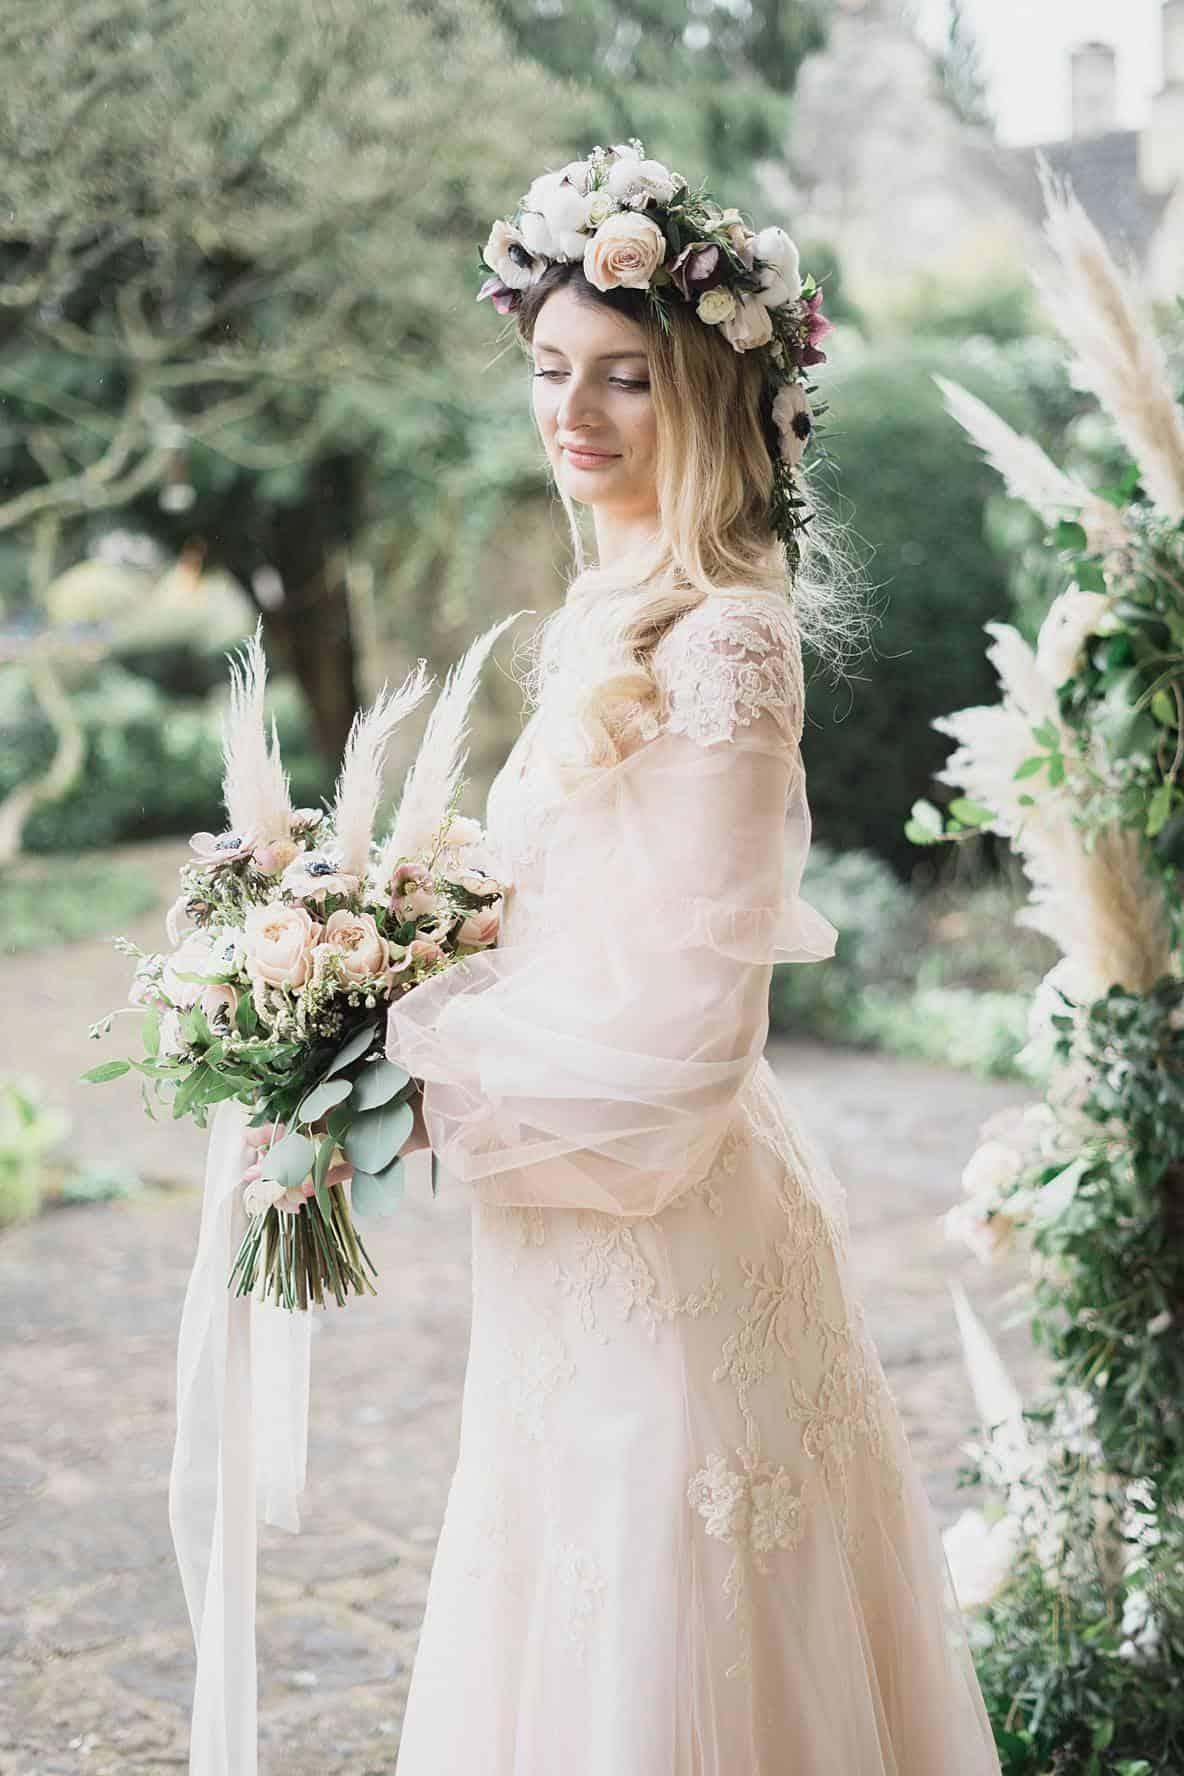 bride in peach wedding dress at Barnsley House for wedding photographer